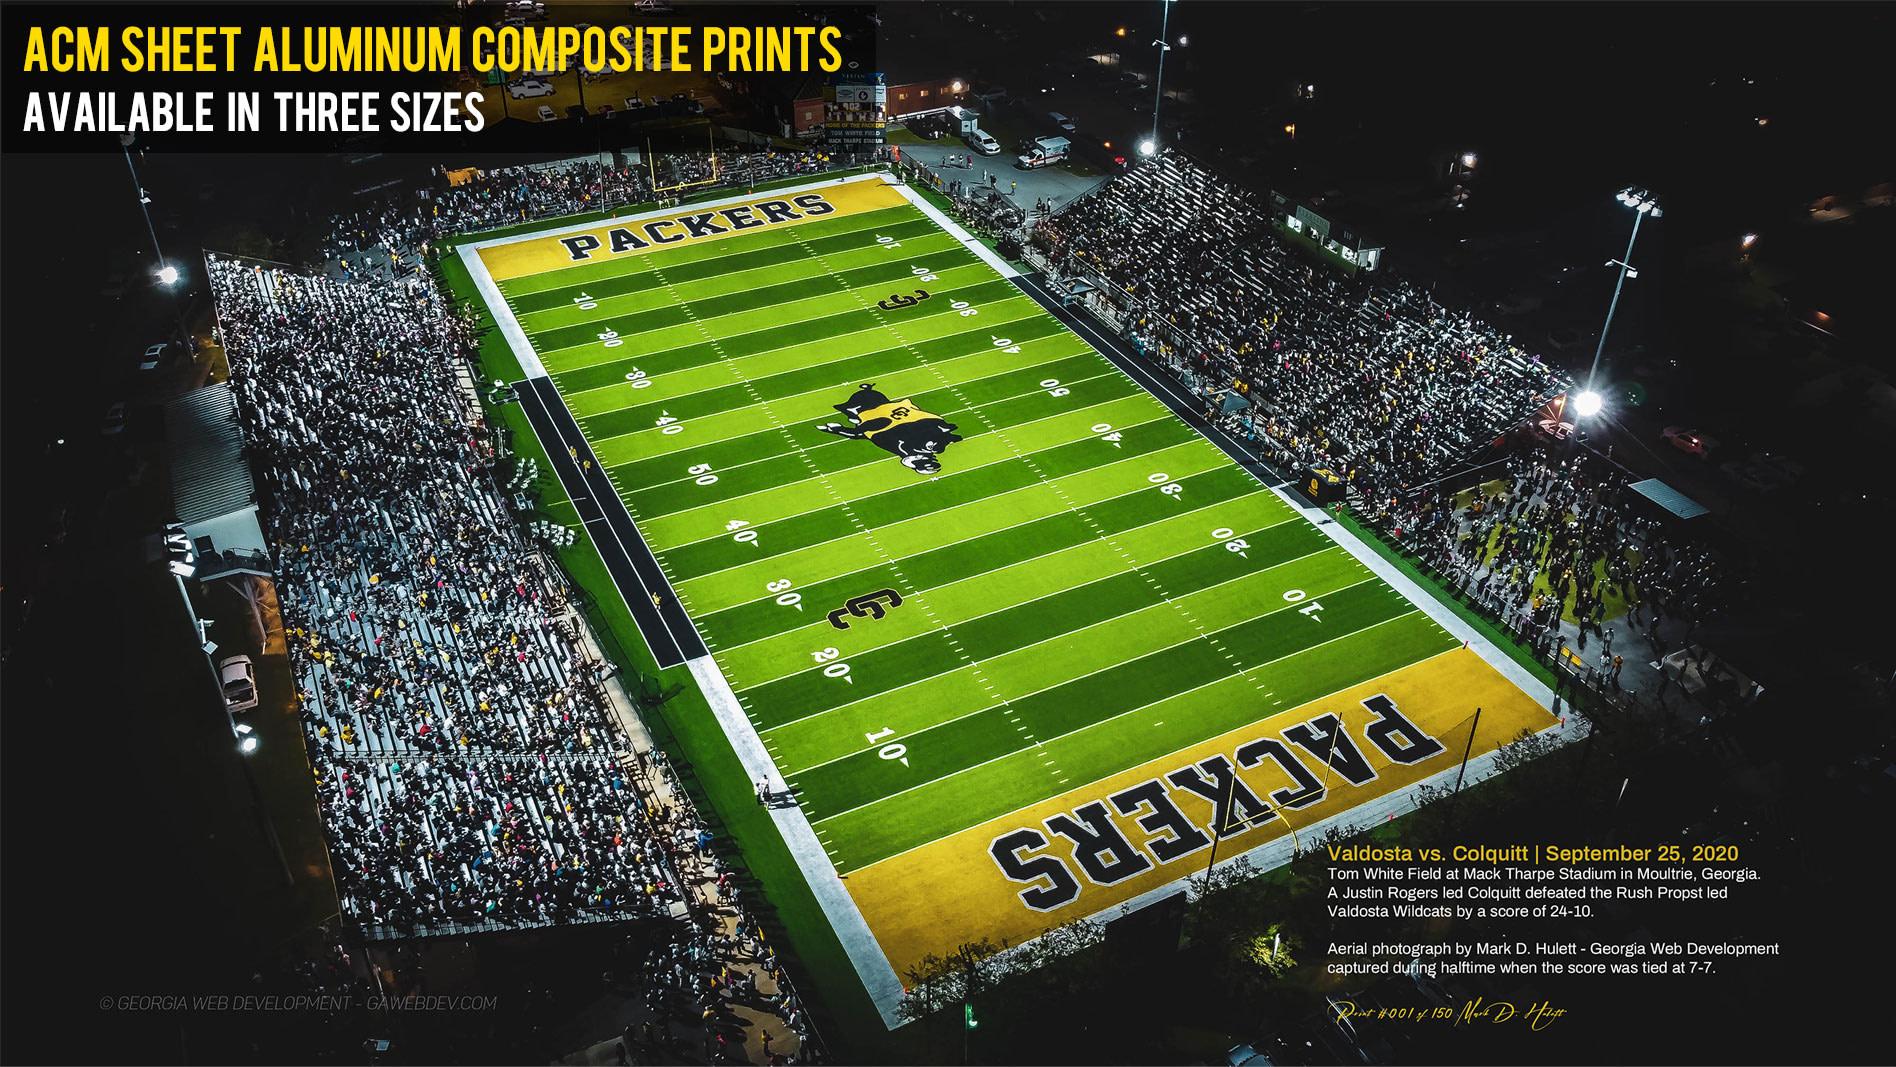 acm-prints-valdosta-vs-colquitt-2020-stadium-shot